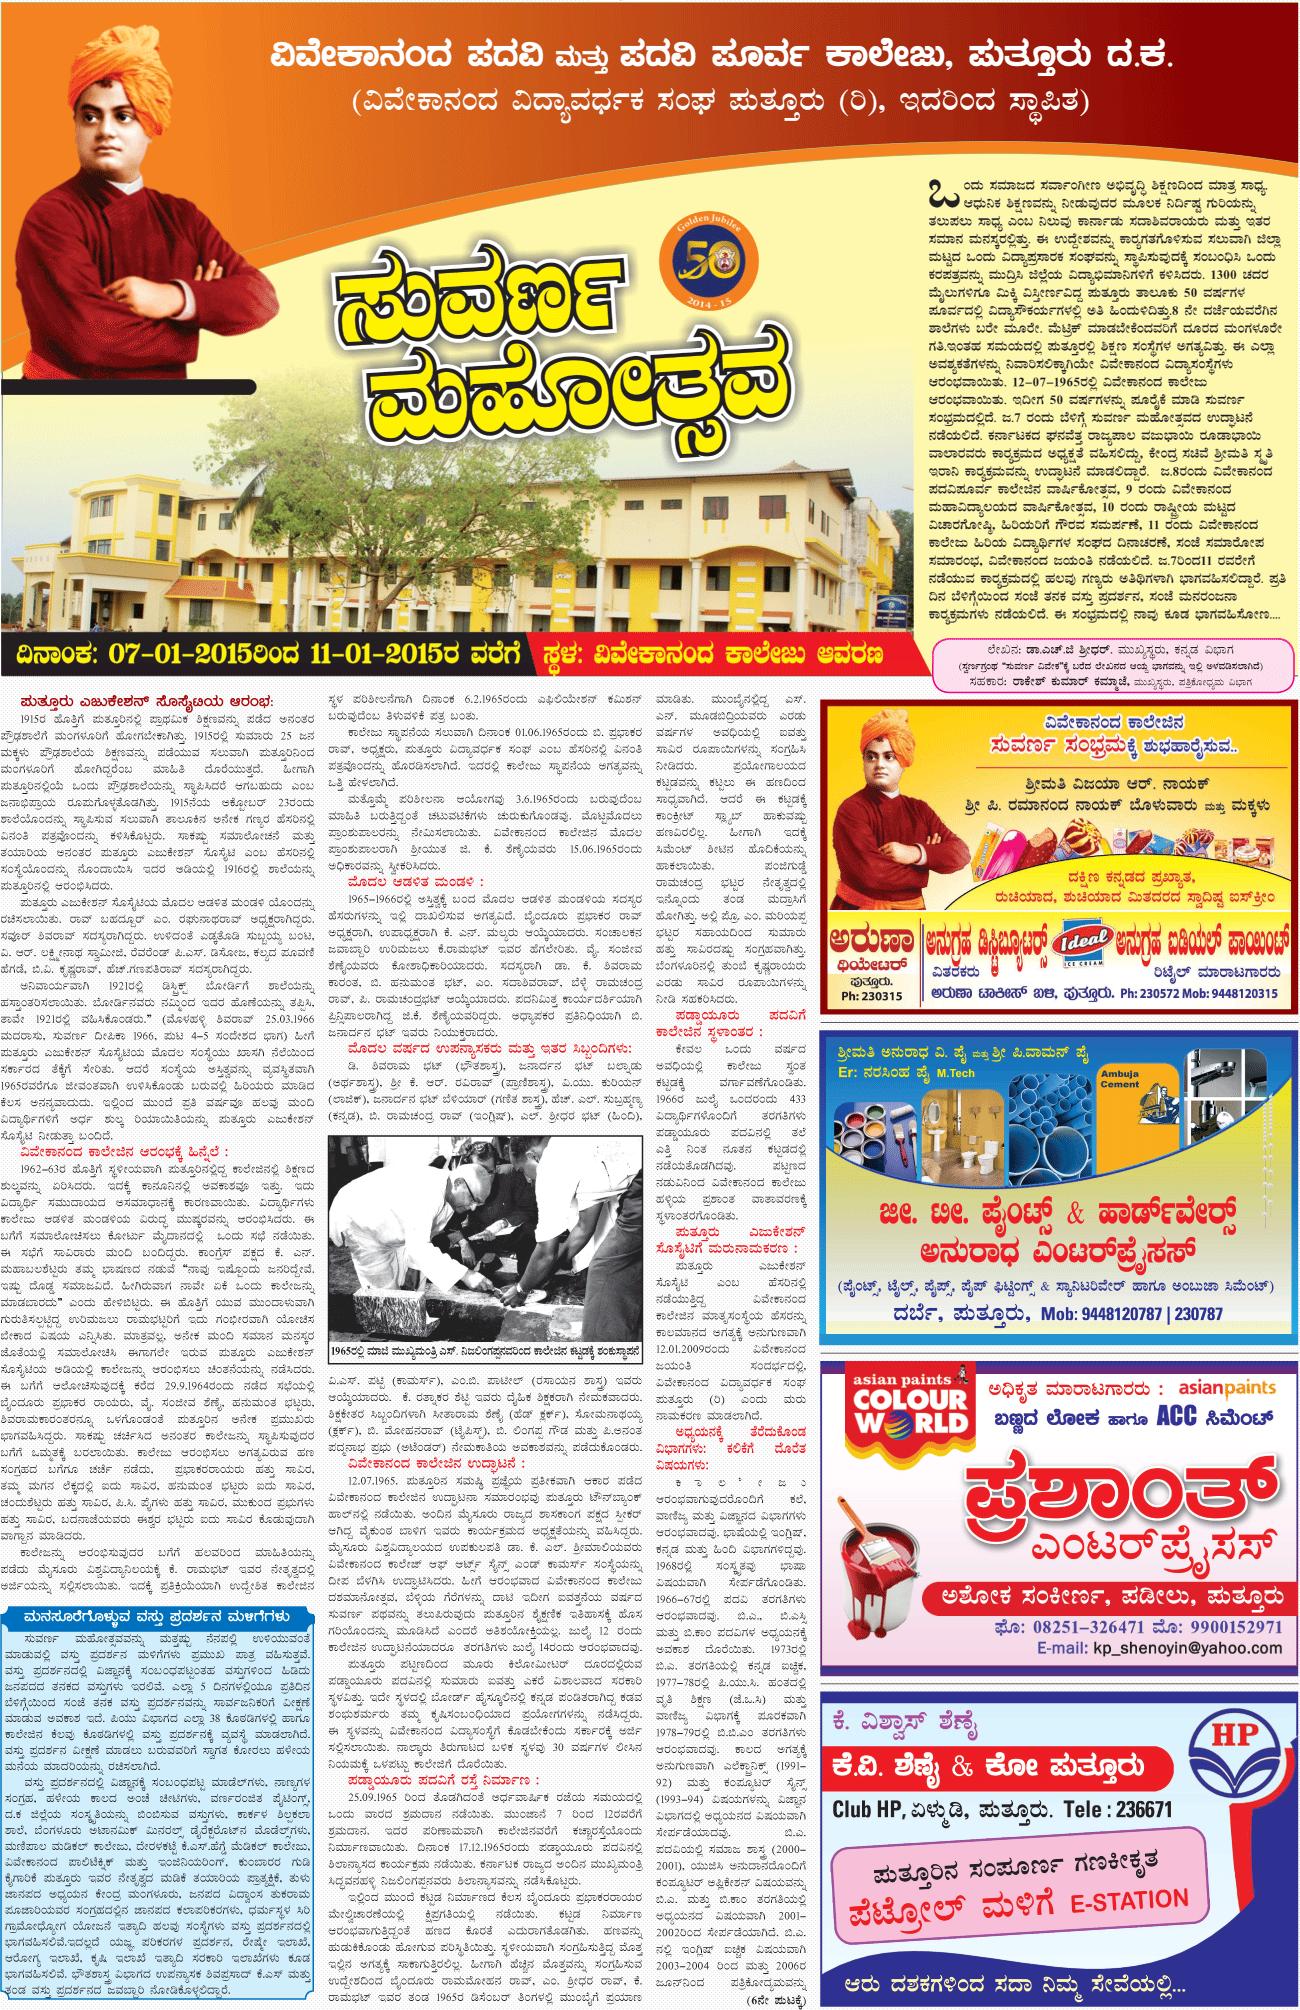 SB 07-01-2015, Page 5